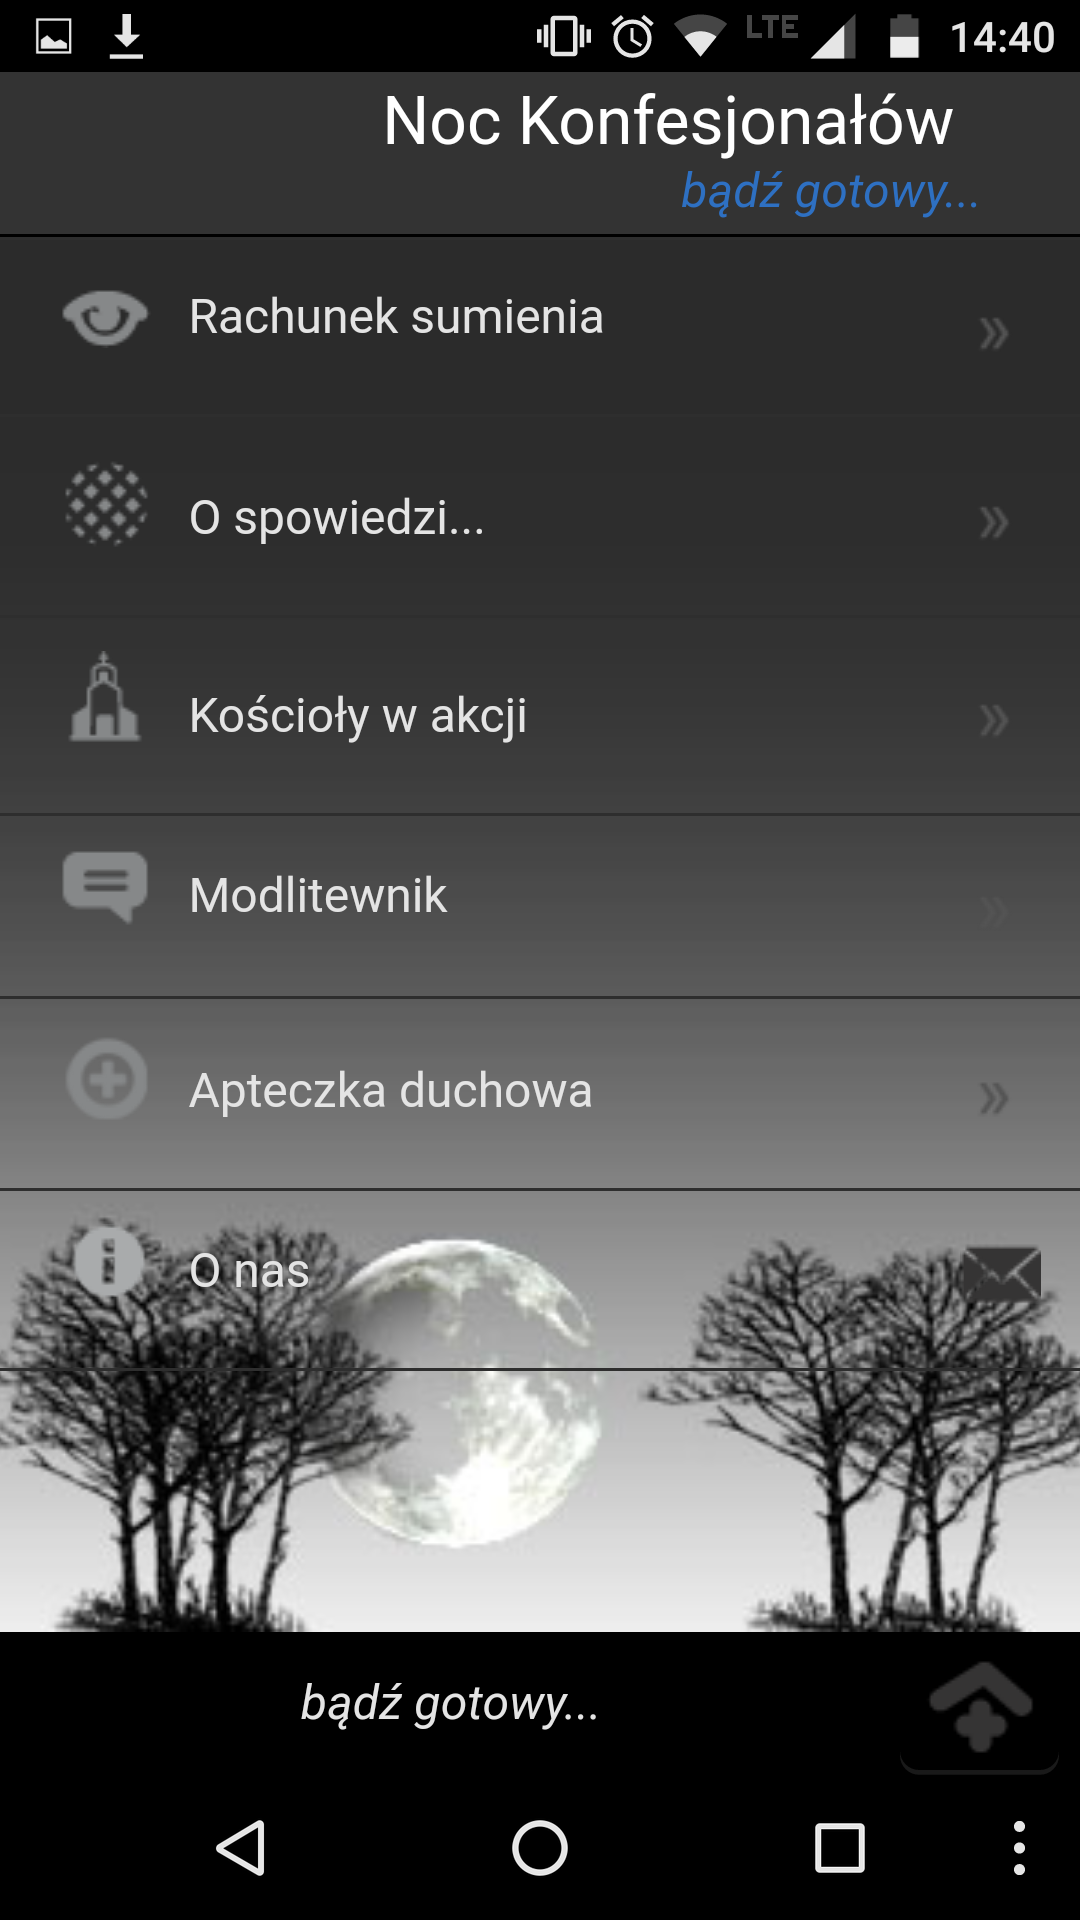 screenshot_20161212-144026